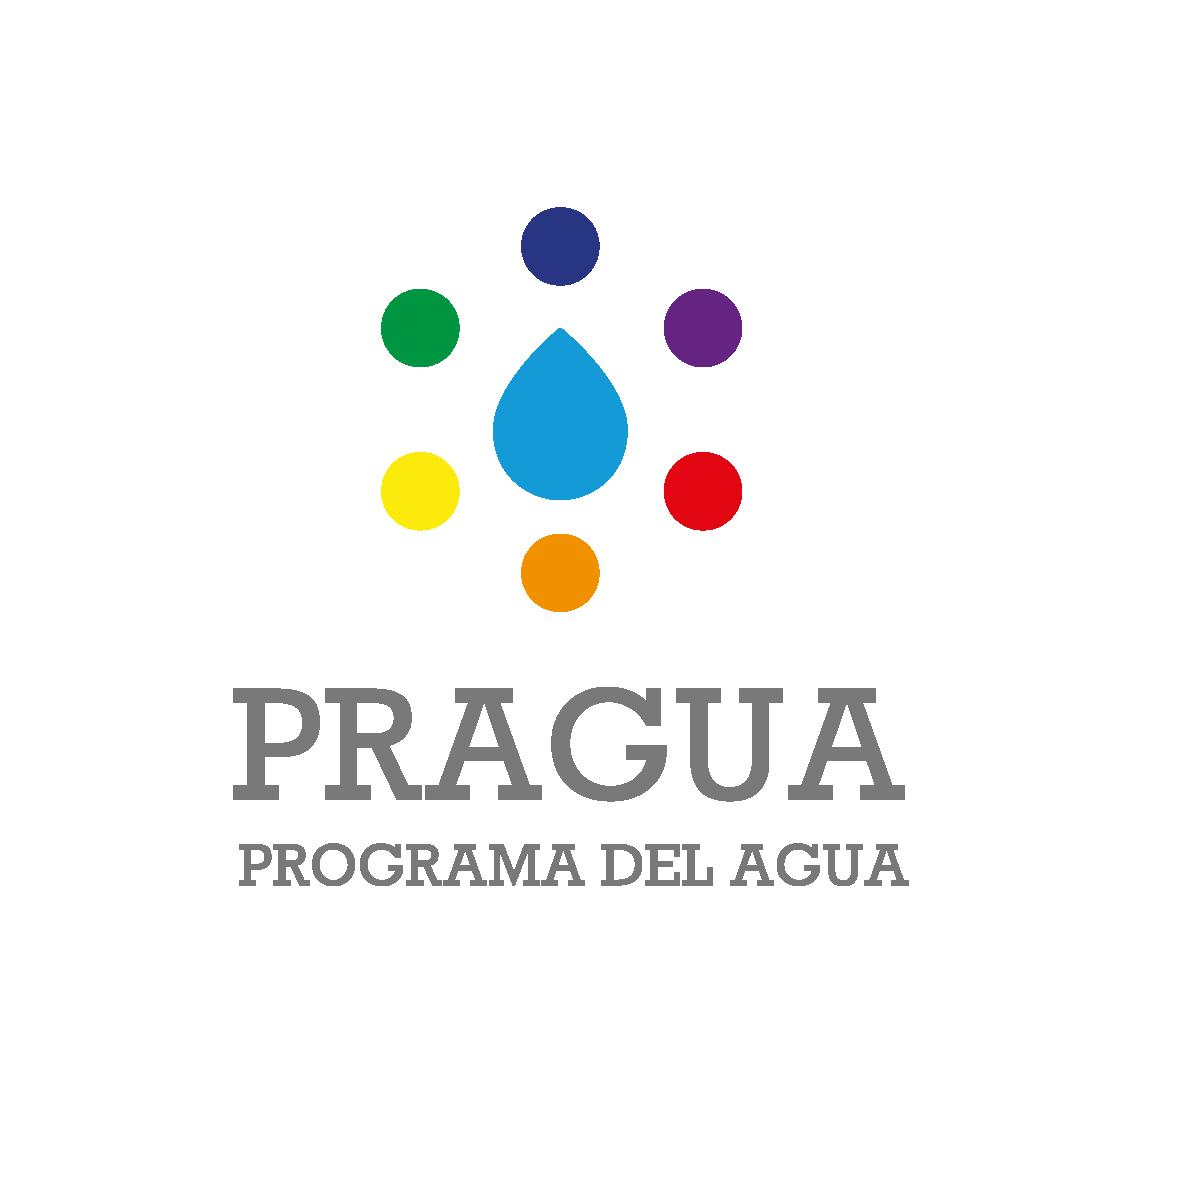 20 10 08 PRAGUA logo rgb_Mesa de trabajo 1 copia 2_Mesa de trabajo 1_Mesa de trabajo 1 copia